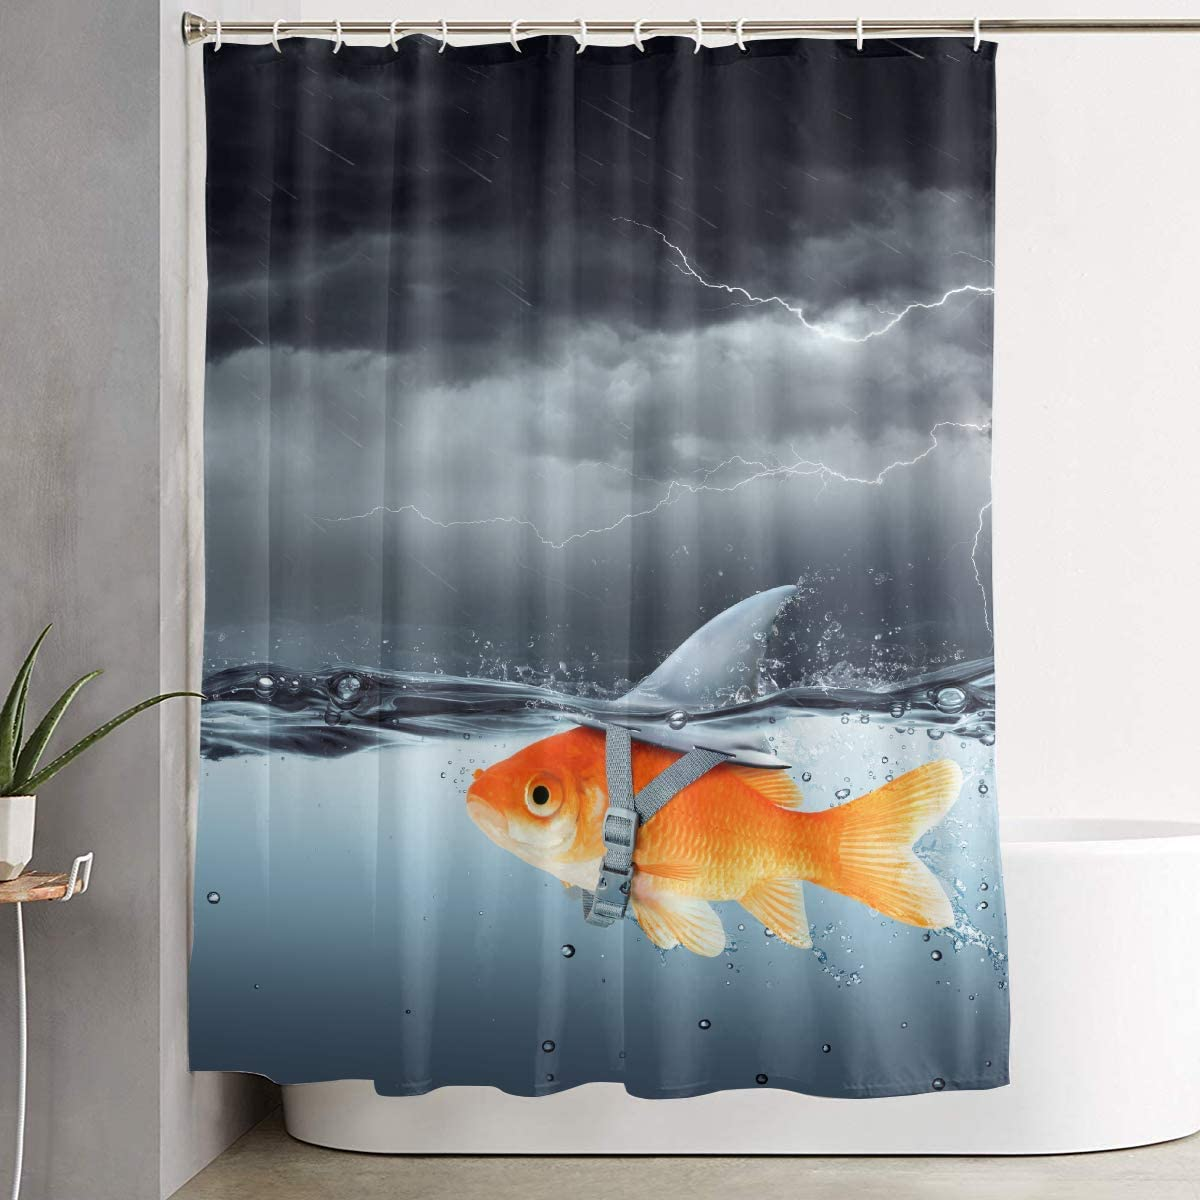 Jianyue Goldfish Shark Fin Bathroom Grey Shower Curtain,Bathroom Curtains Sets with Hooks Shower Bath Curtain for Bathroom,Polyester Bathroom Shower Curtain